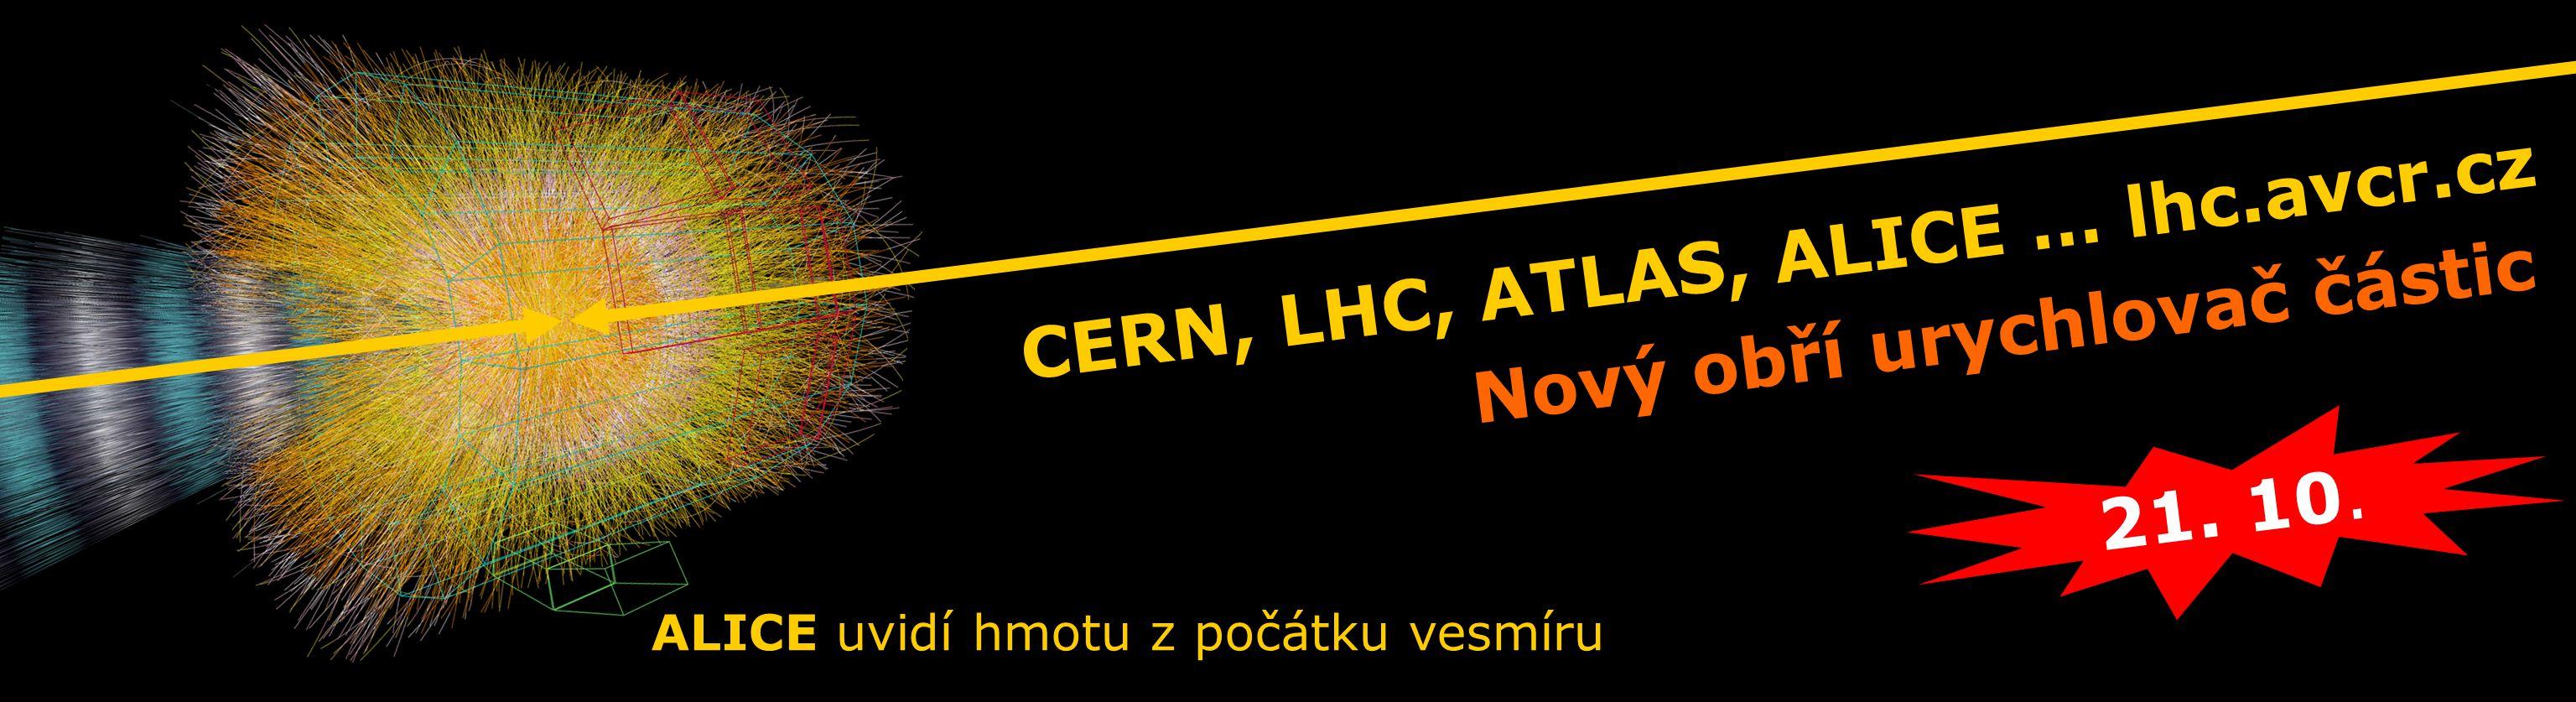 CERN, LHC, ATLAS, ALICE … lhc.avcr.cz 21. 10.